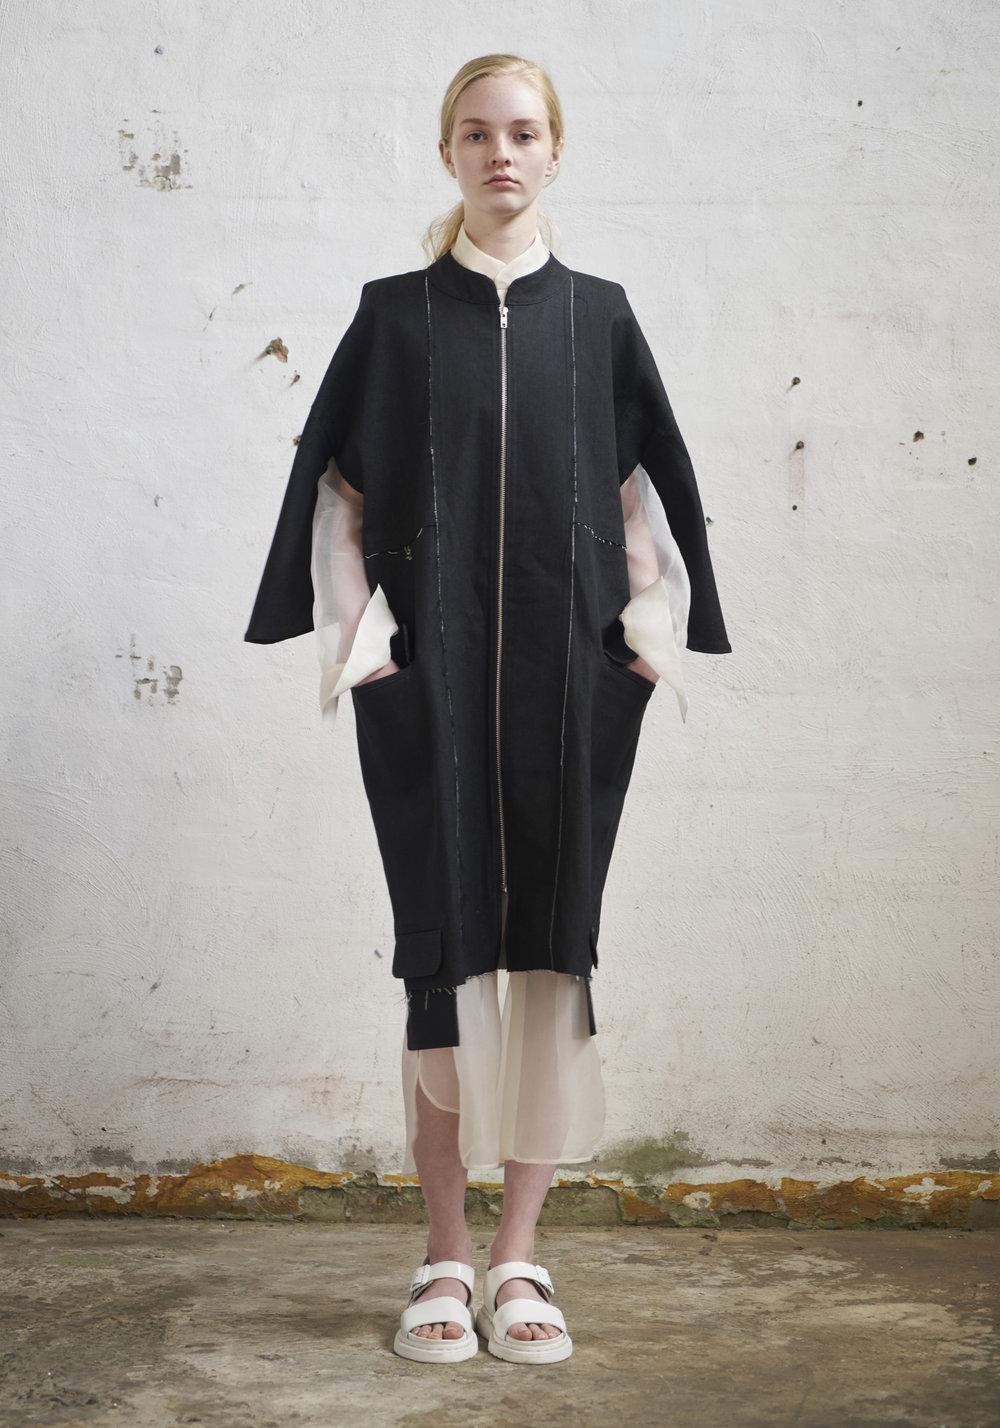 L O O K 2 0  901/S178232L Long Paralleled Zip Coat W/Kimono Sleeves  105/S174115 Organza Long Shirt W/Collar Stand